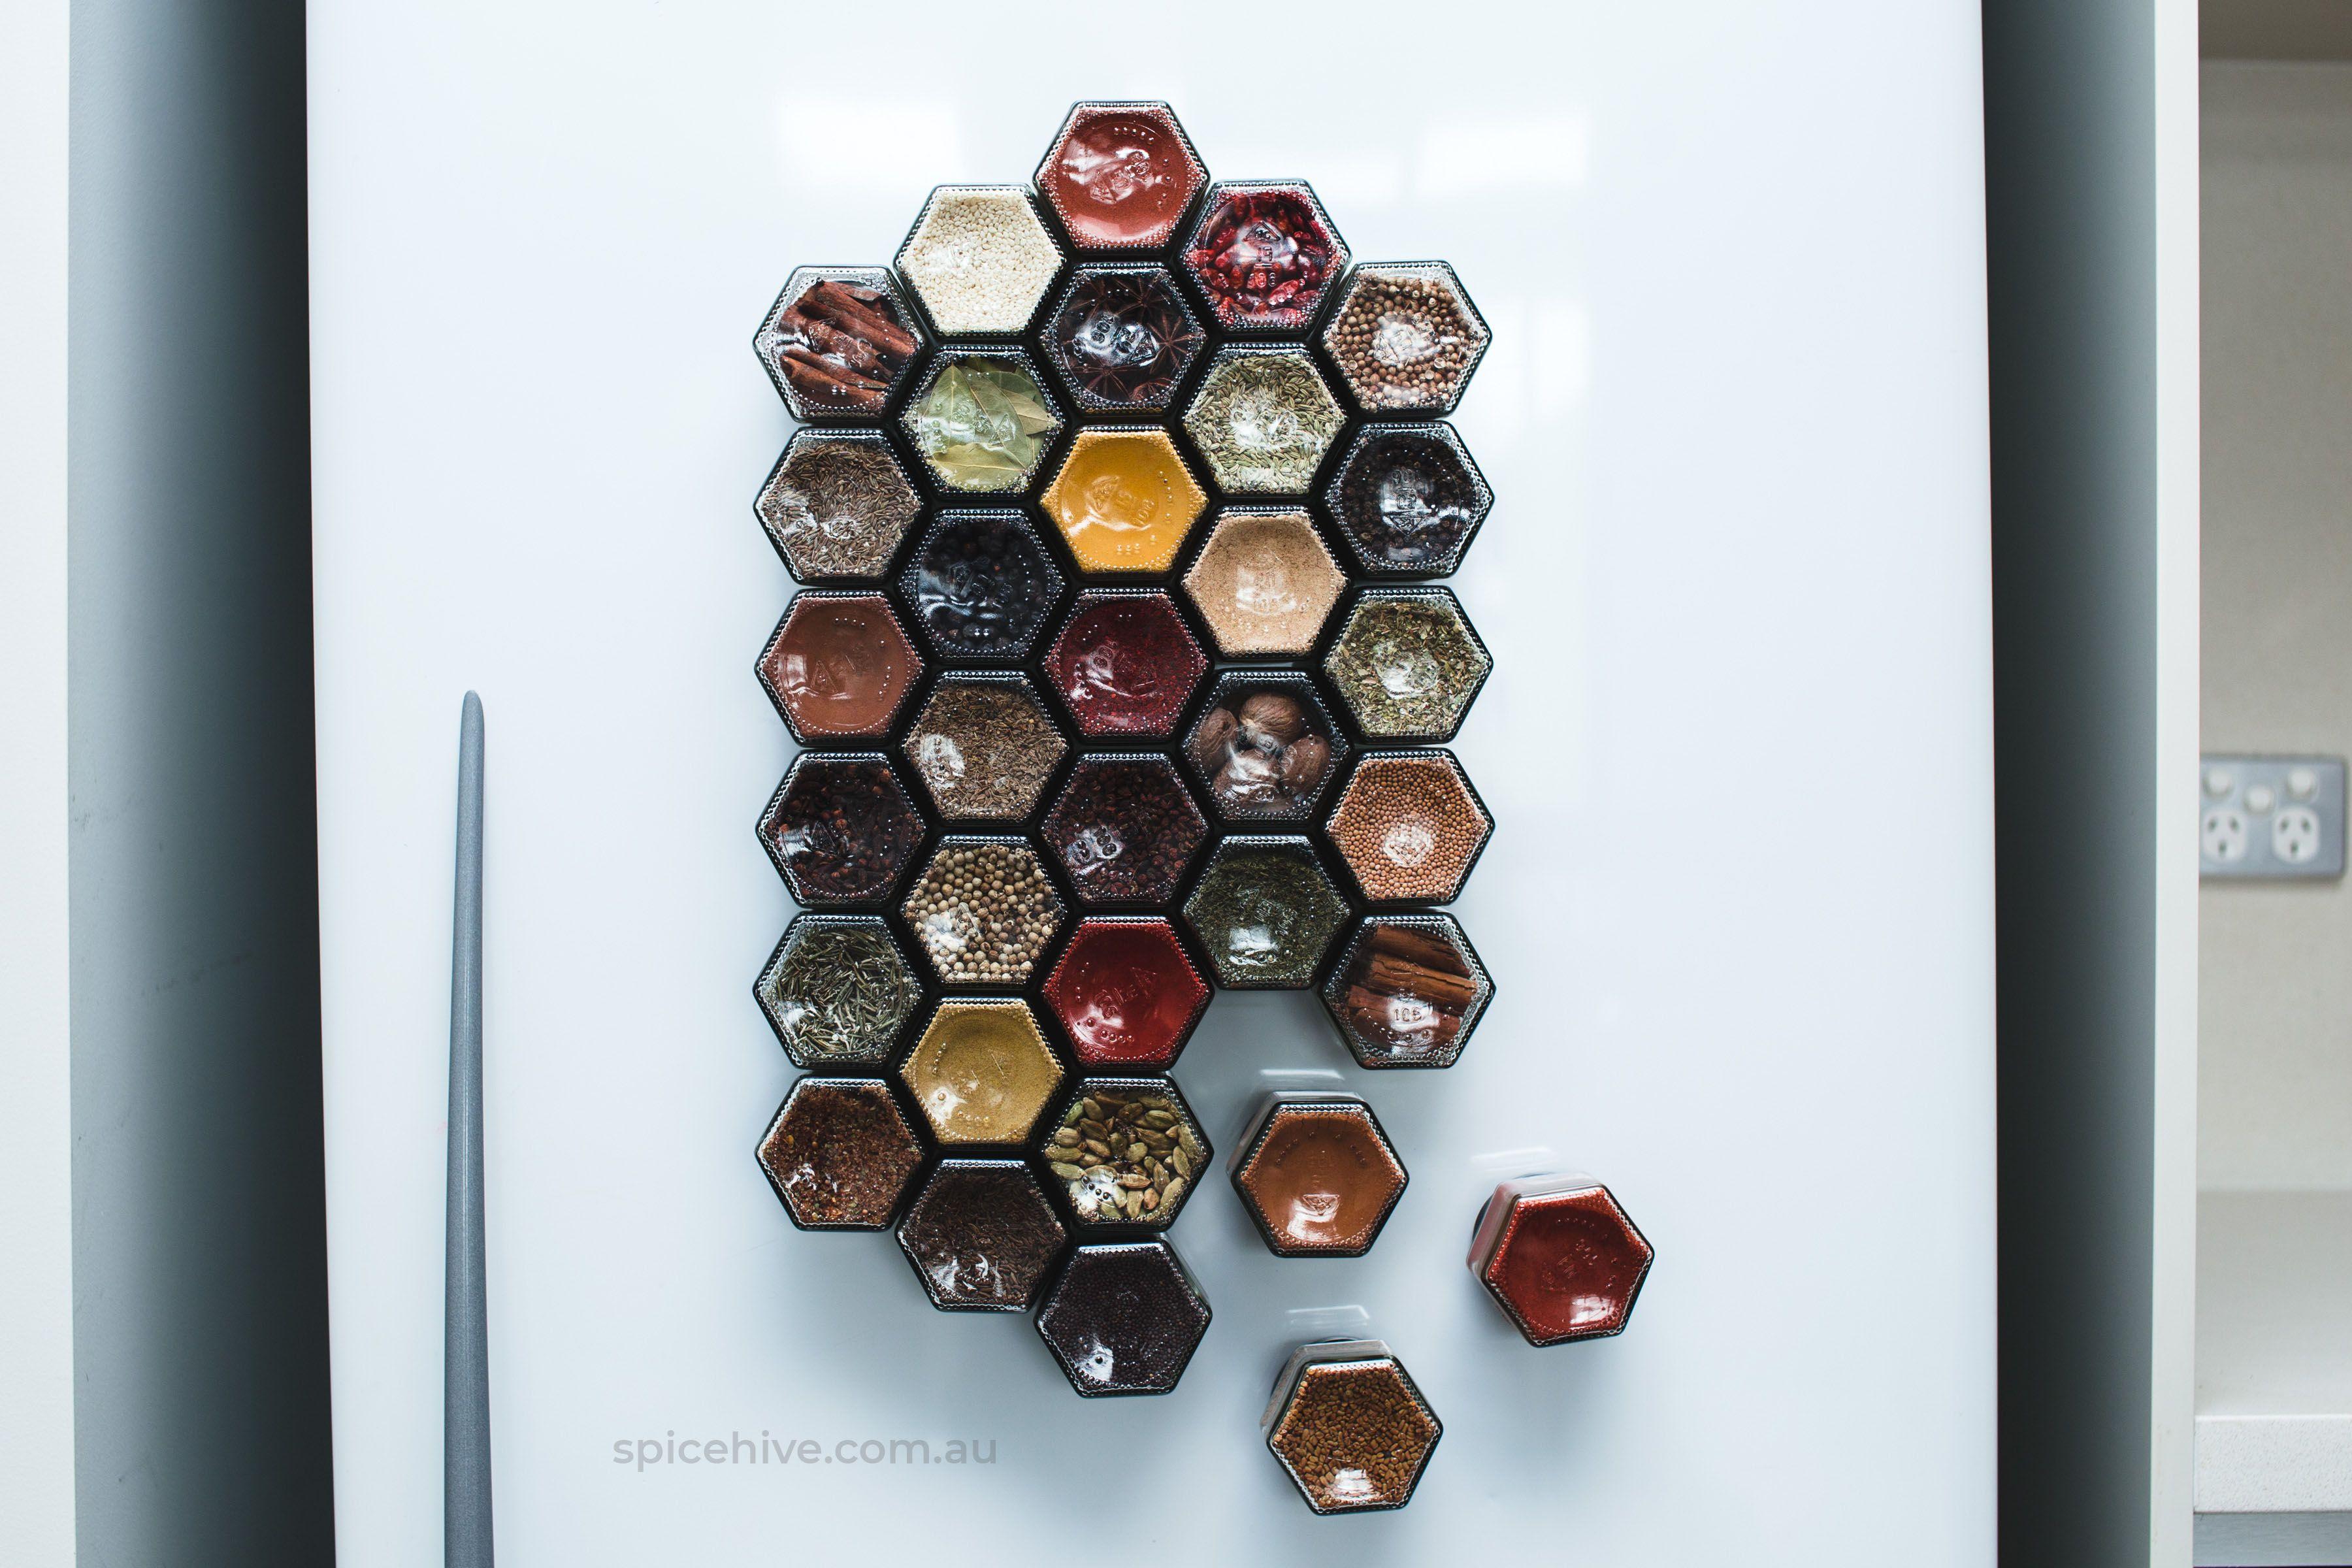 30 hexagonal spice jars diy kit preorder for august